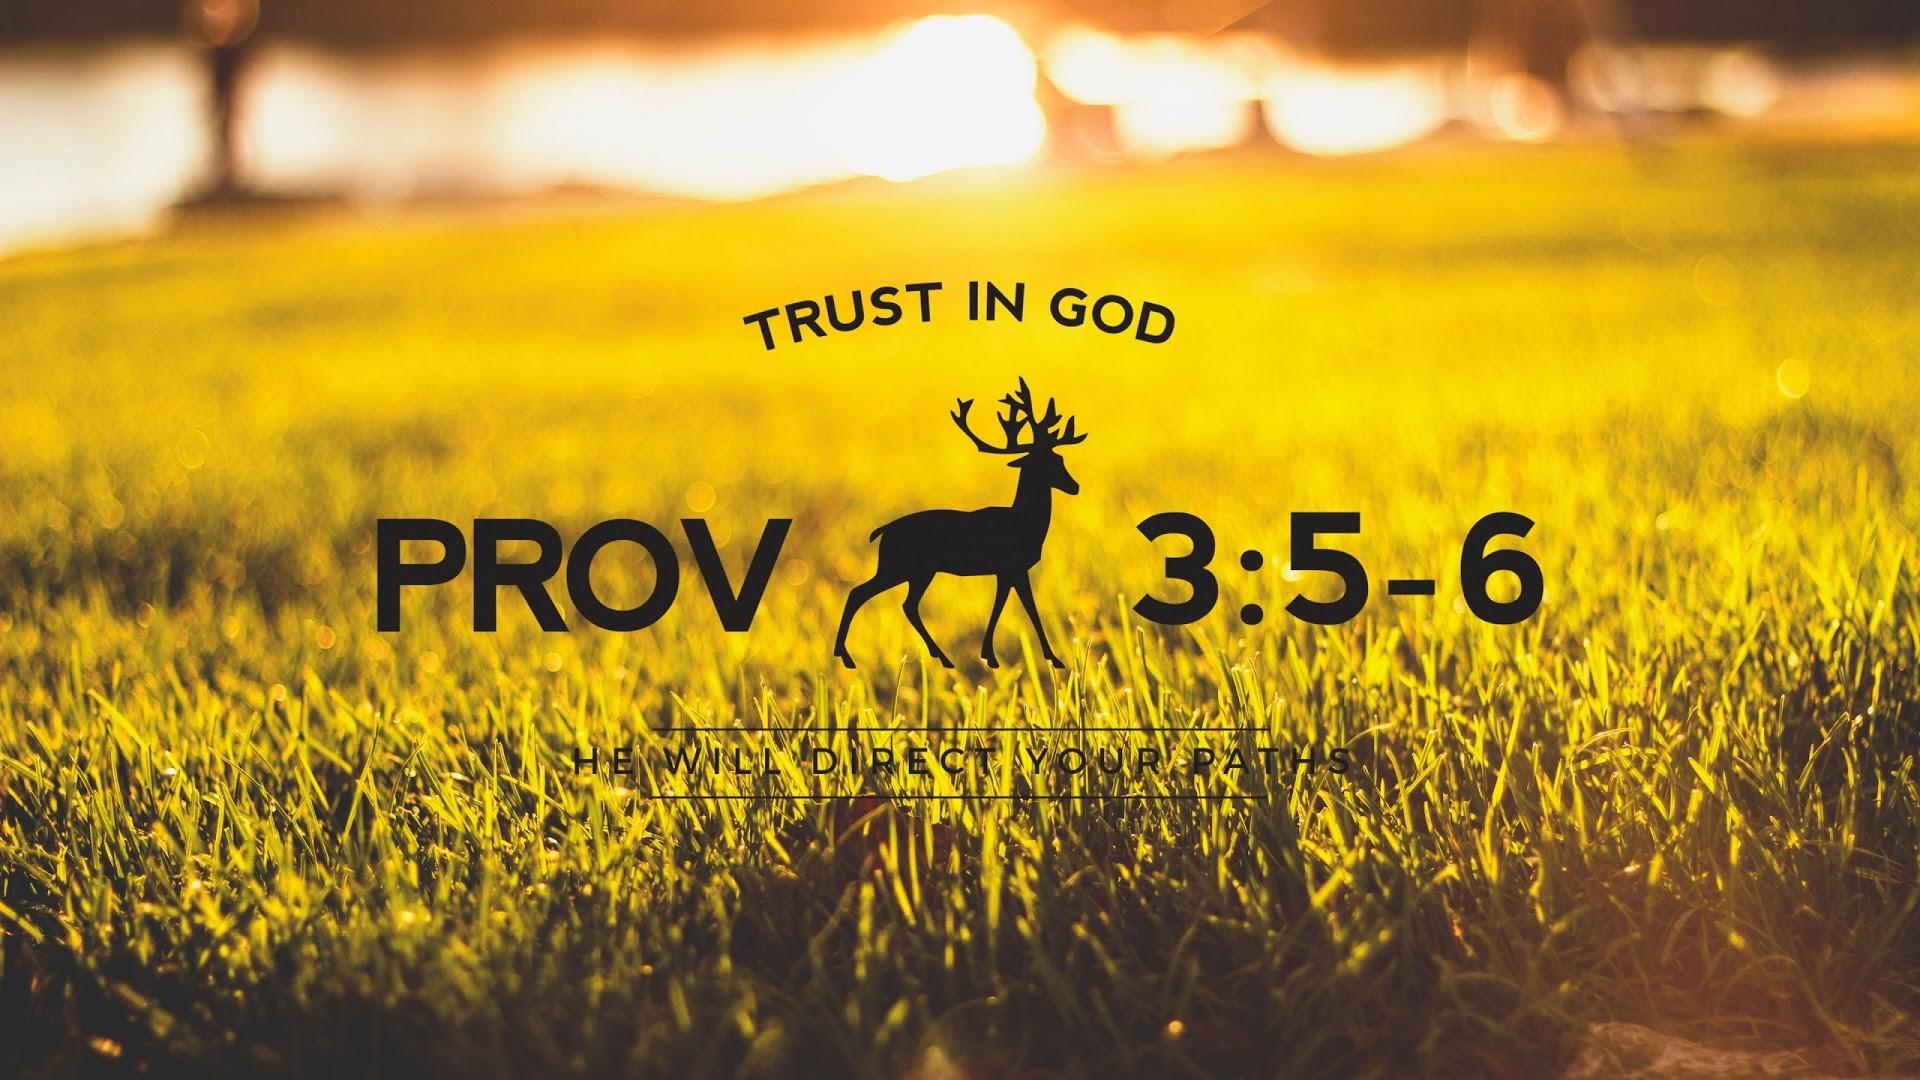 2880x1800 3d Bible Verse Wallpaper Wallpapersafari